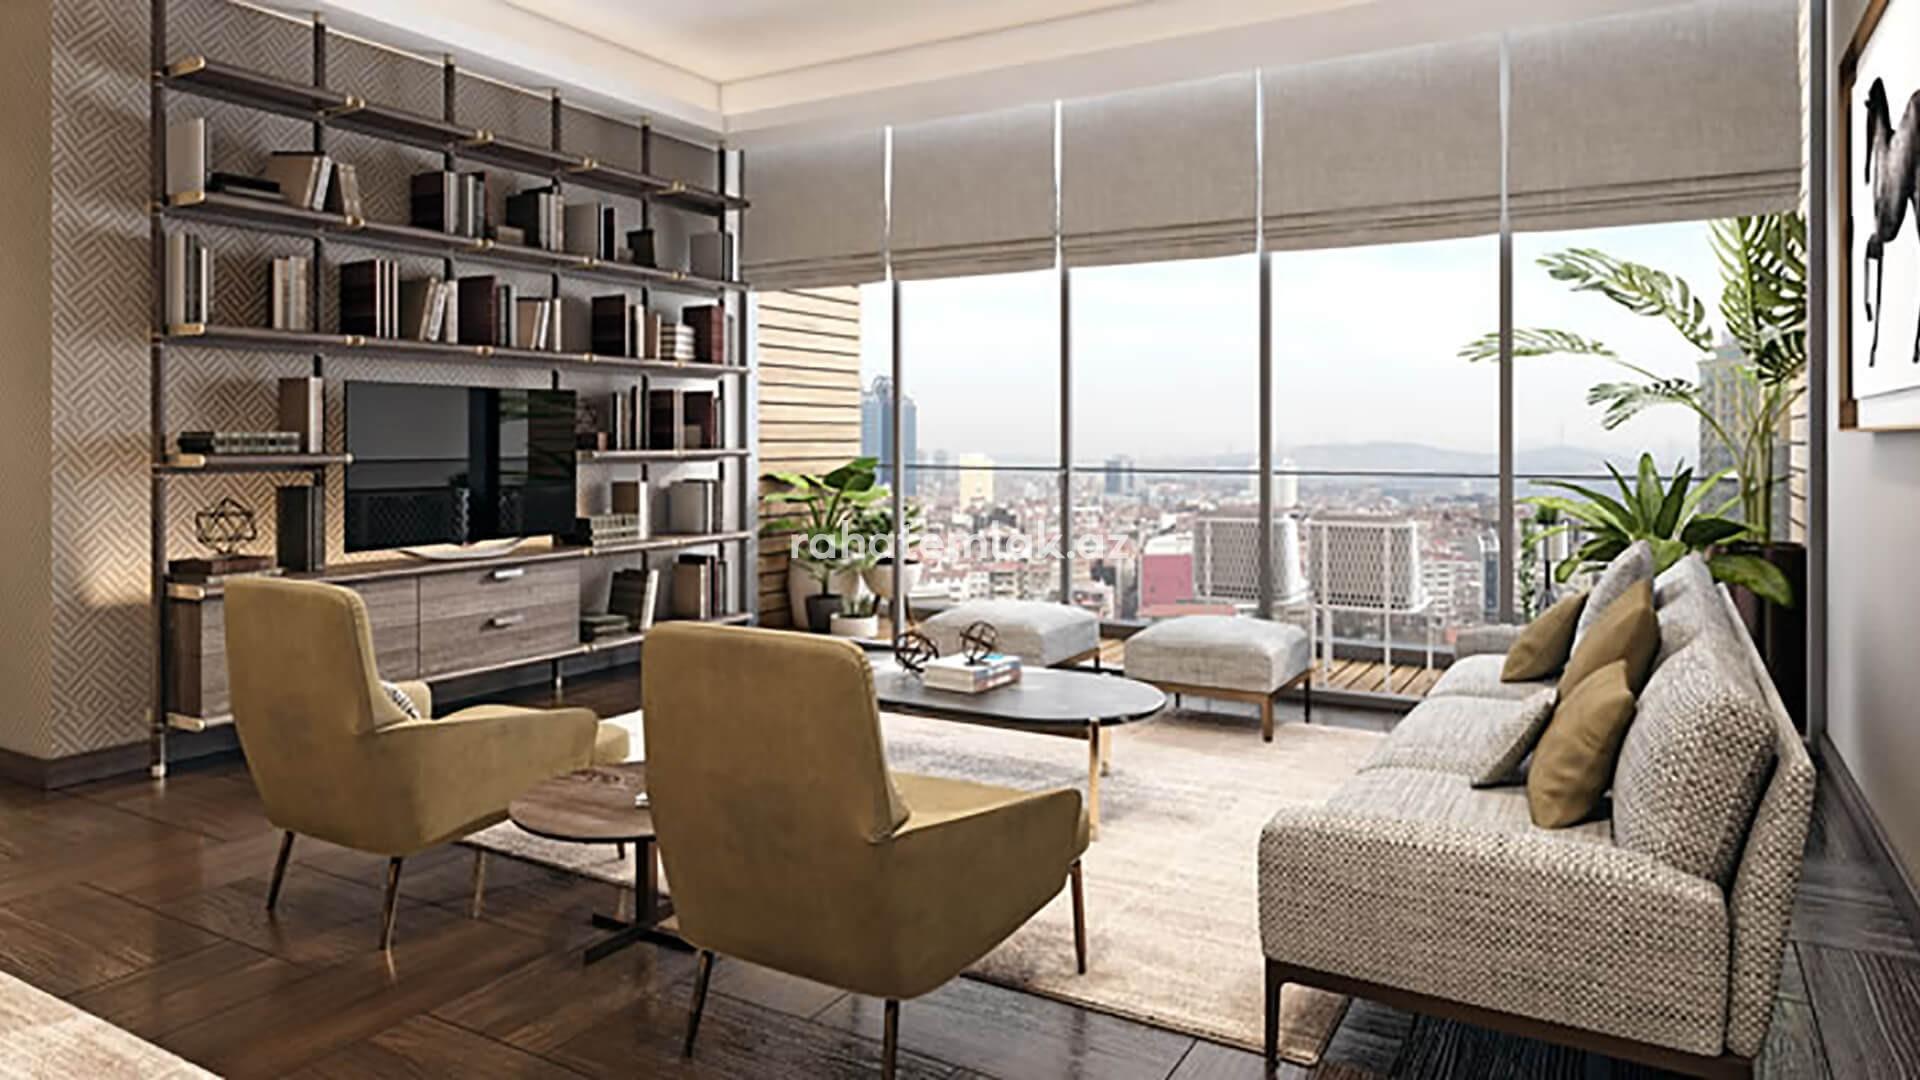 Sisli's last skyscraper residence with Bosphorus views